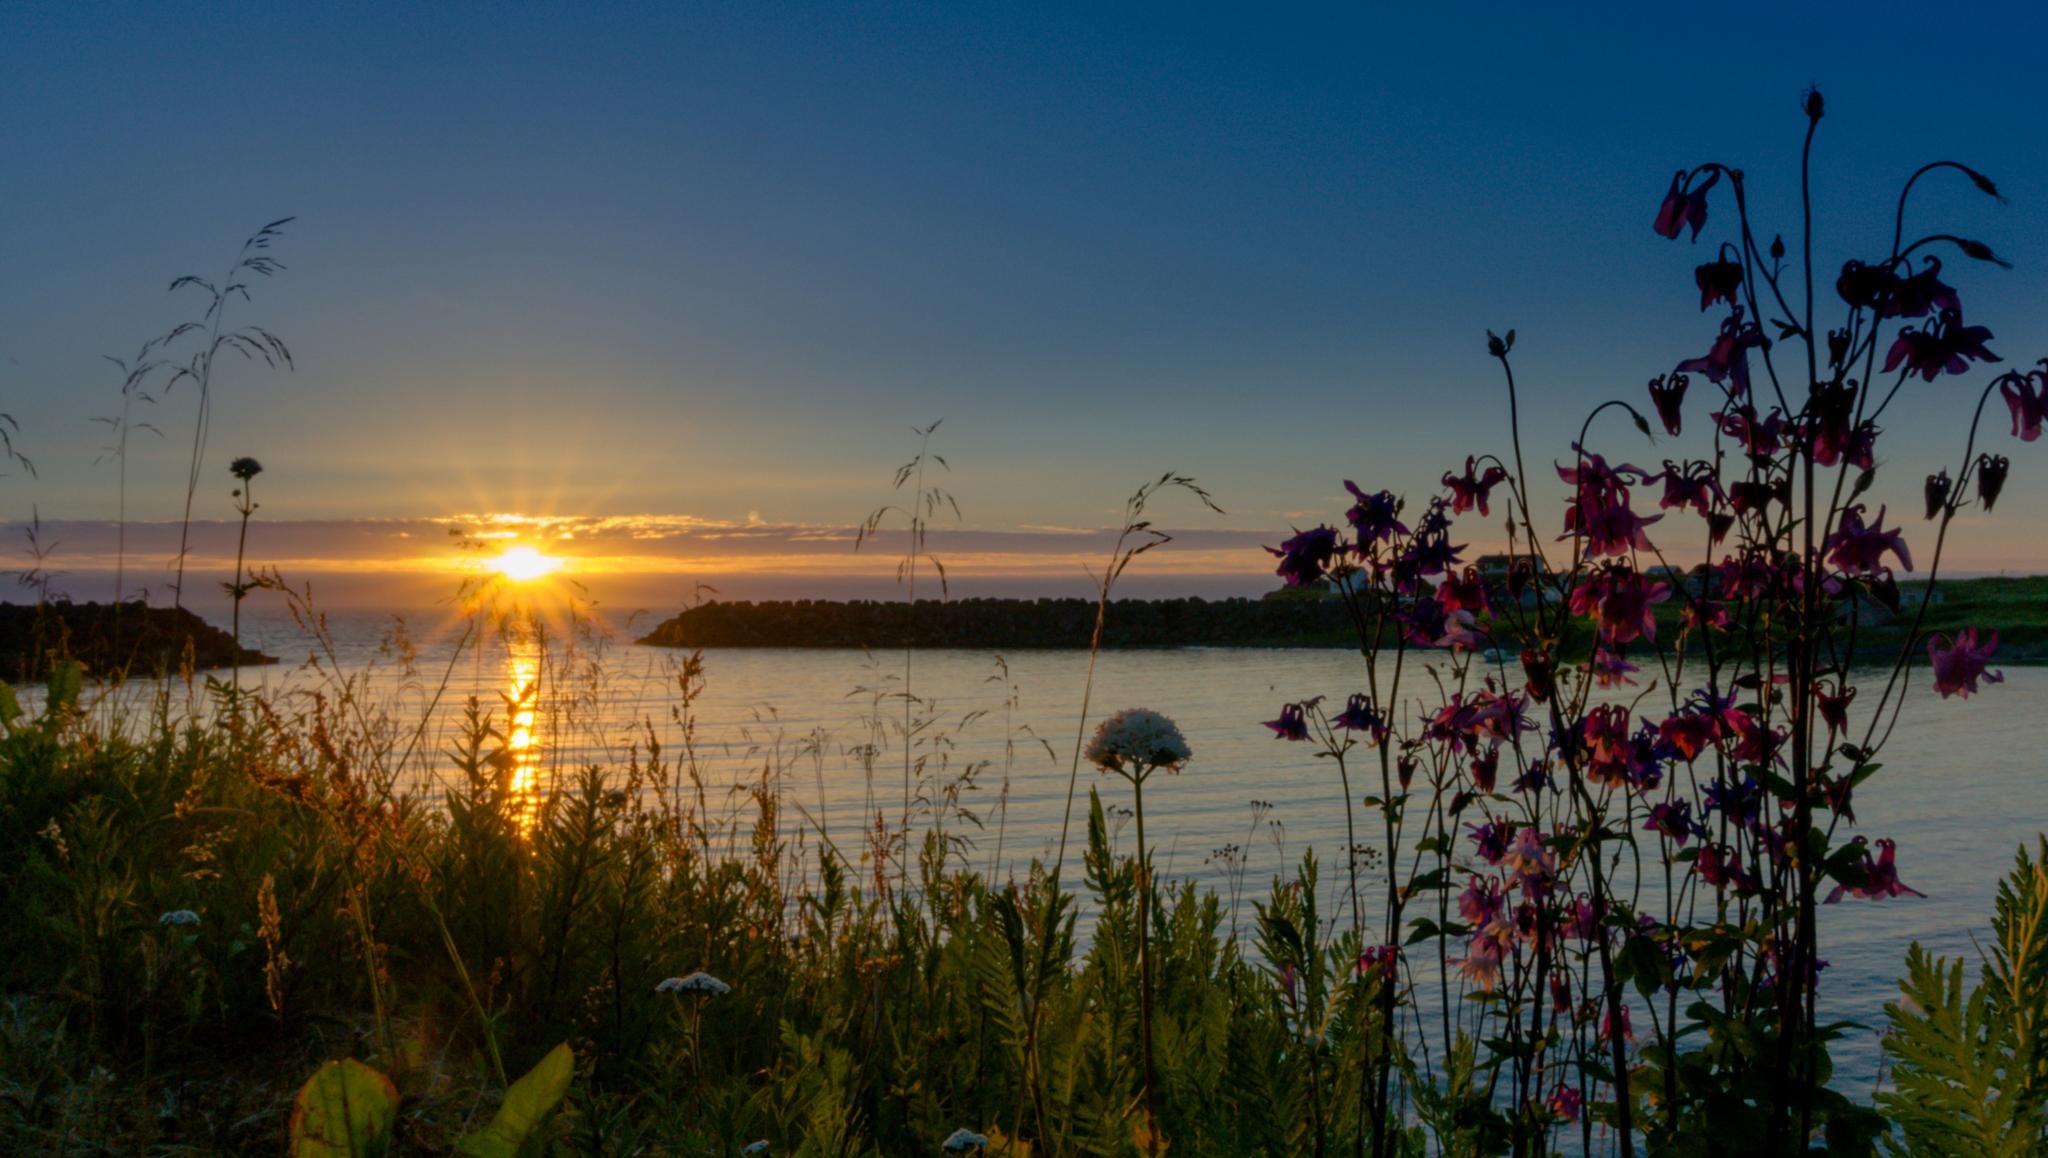 Solnedgang i Nykvåg by harald.larsen